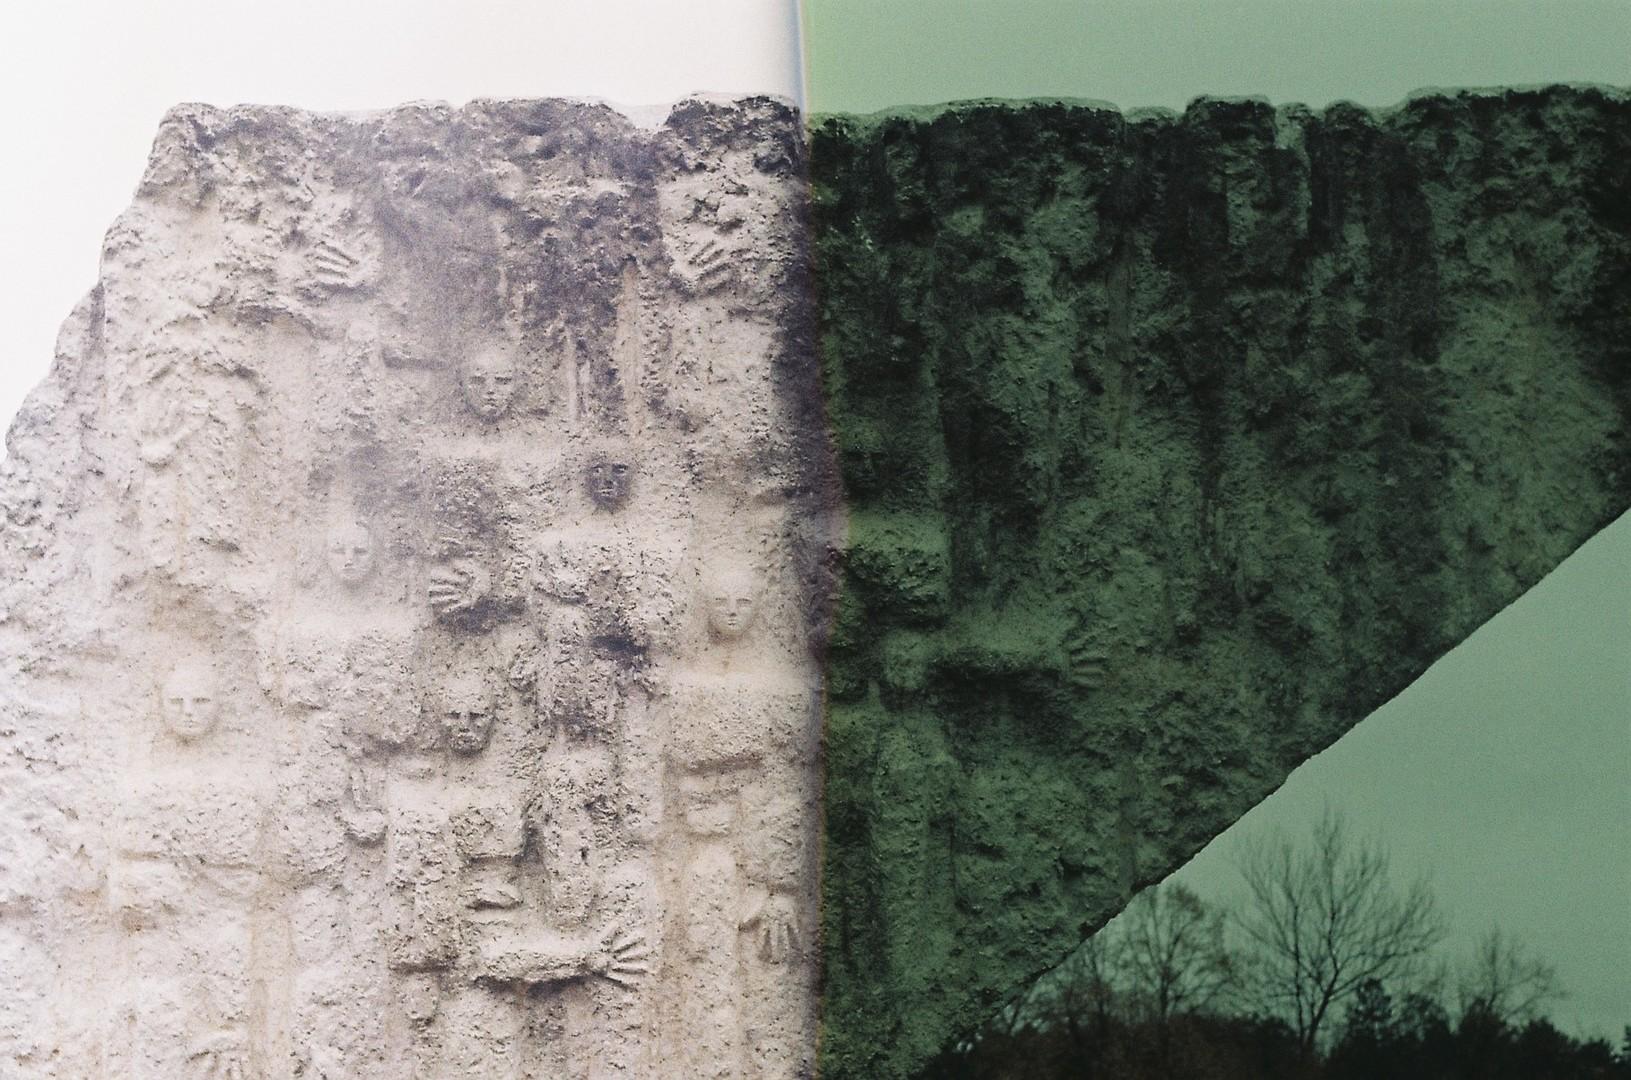 Spomenik streljanim đacima, detalji 1